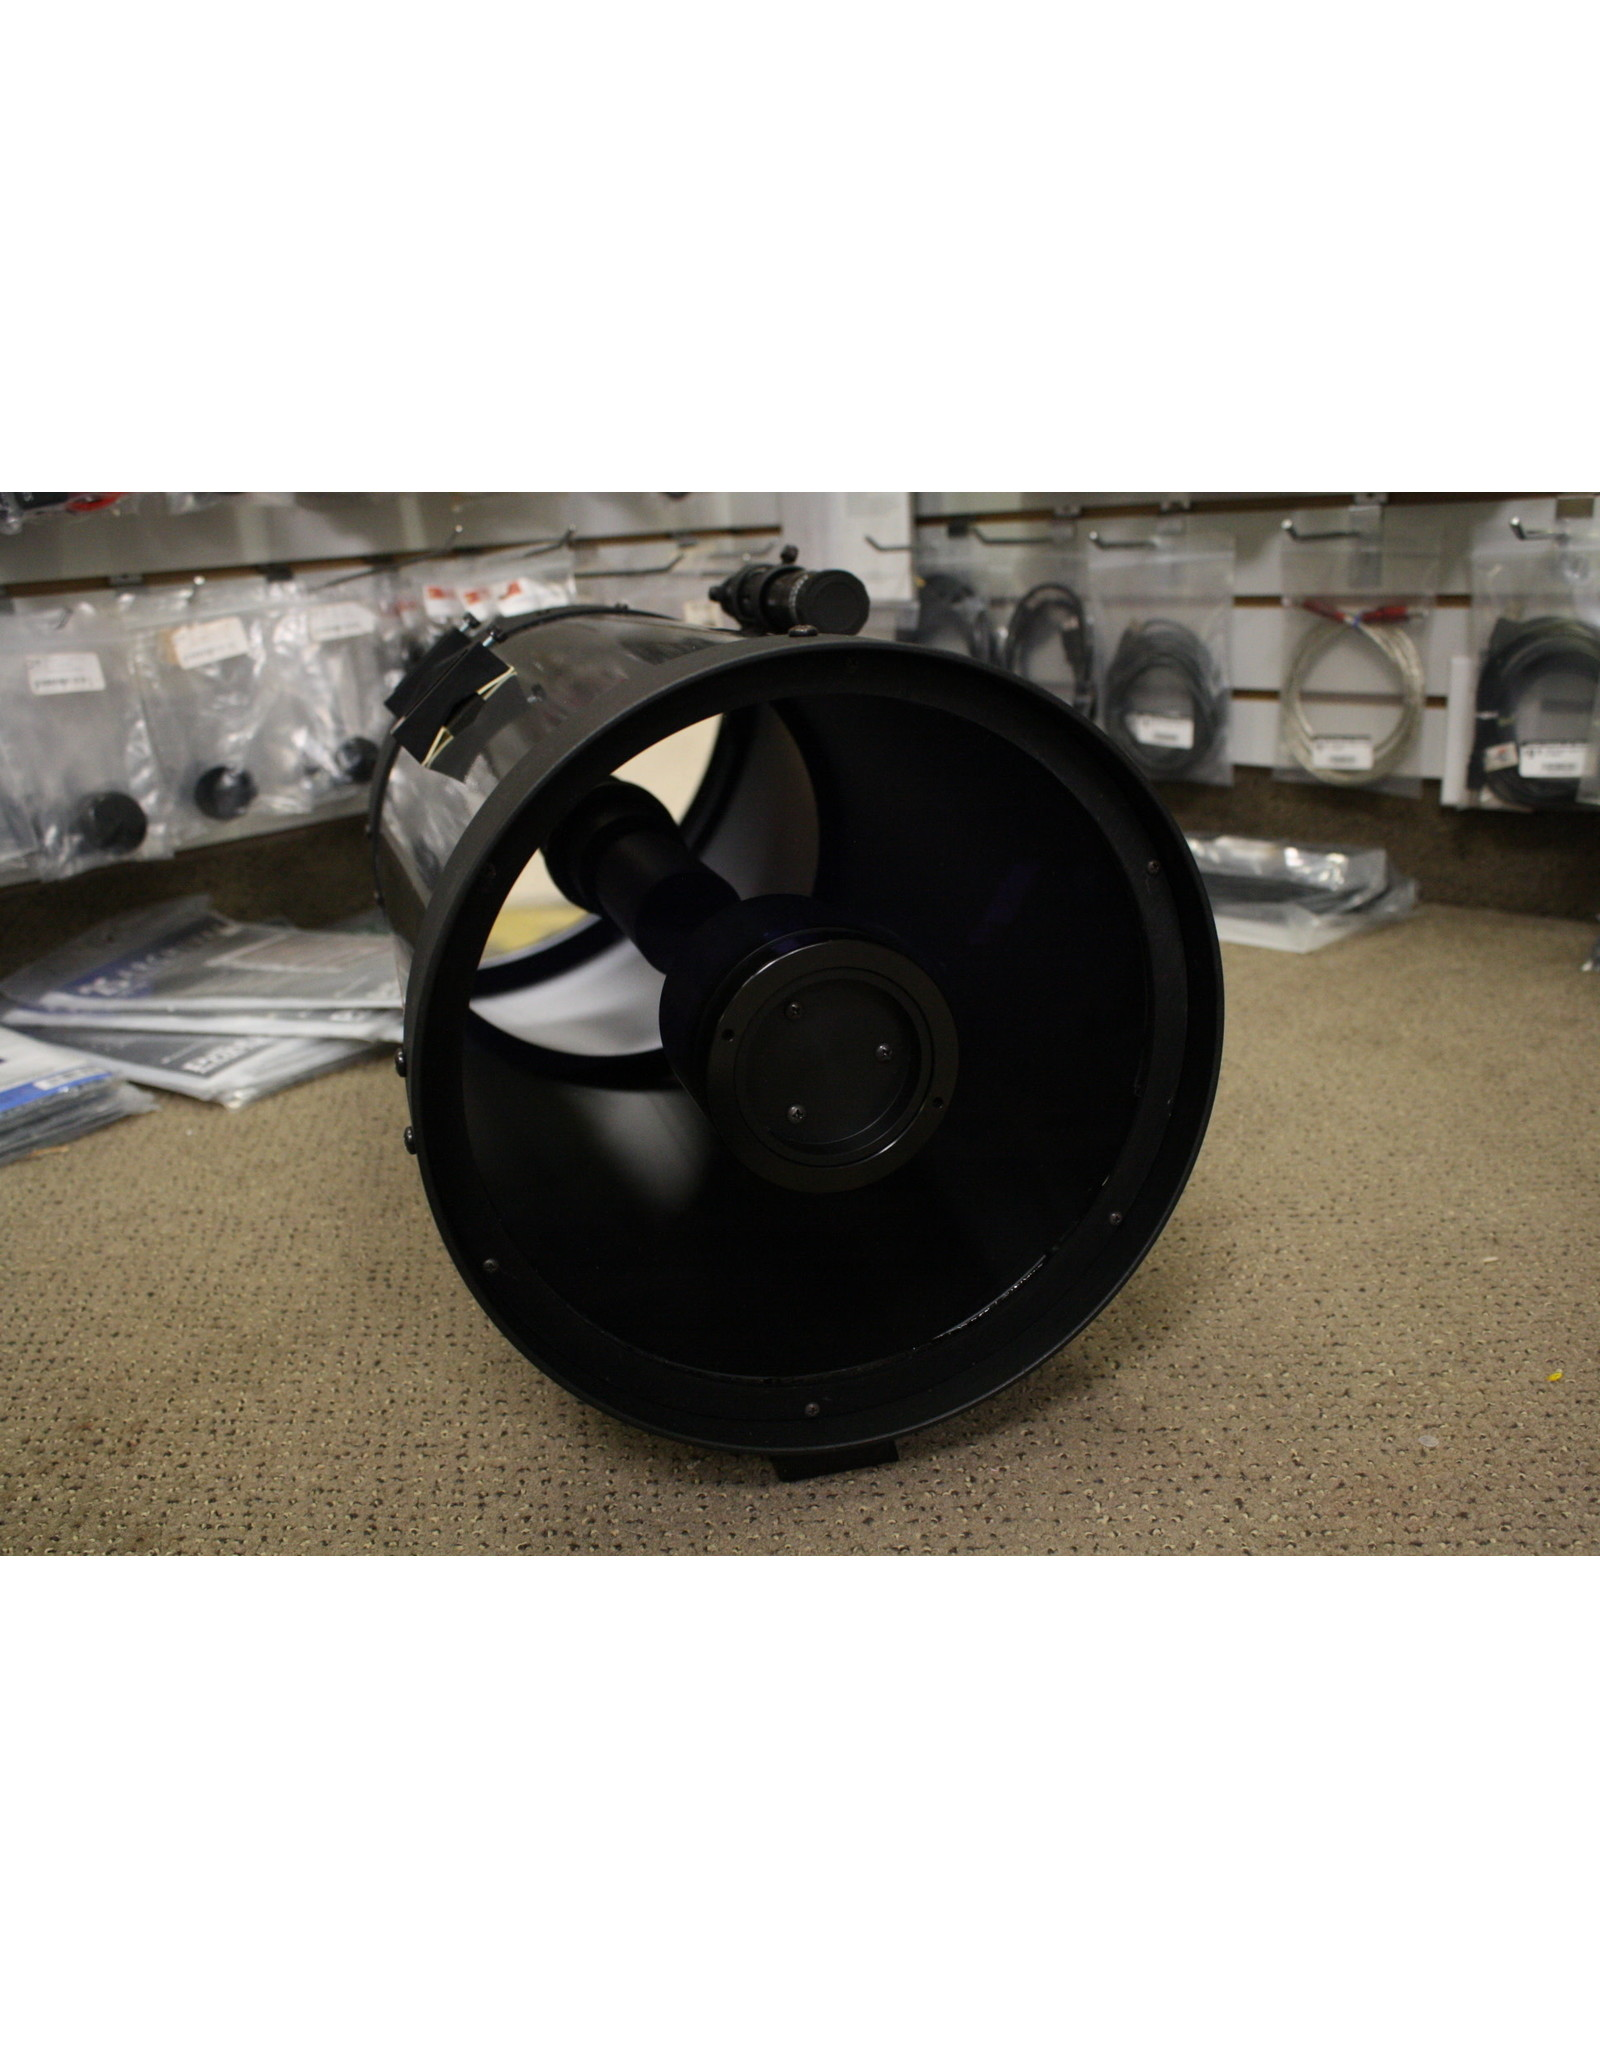 Celestron C9.25 Optical Tube - PRE OWNED